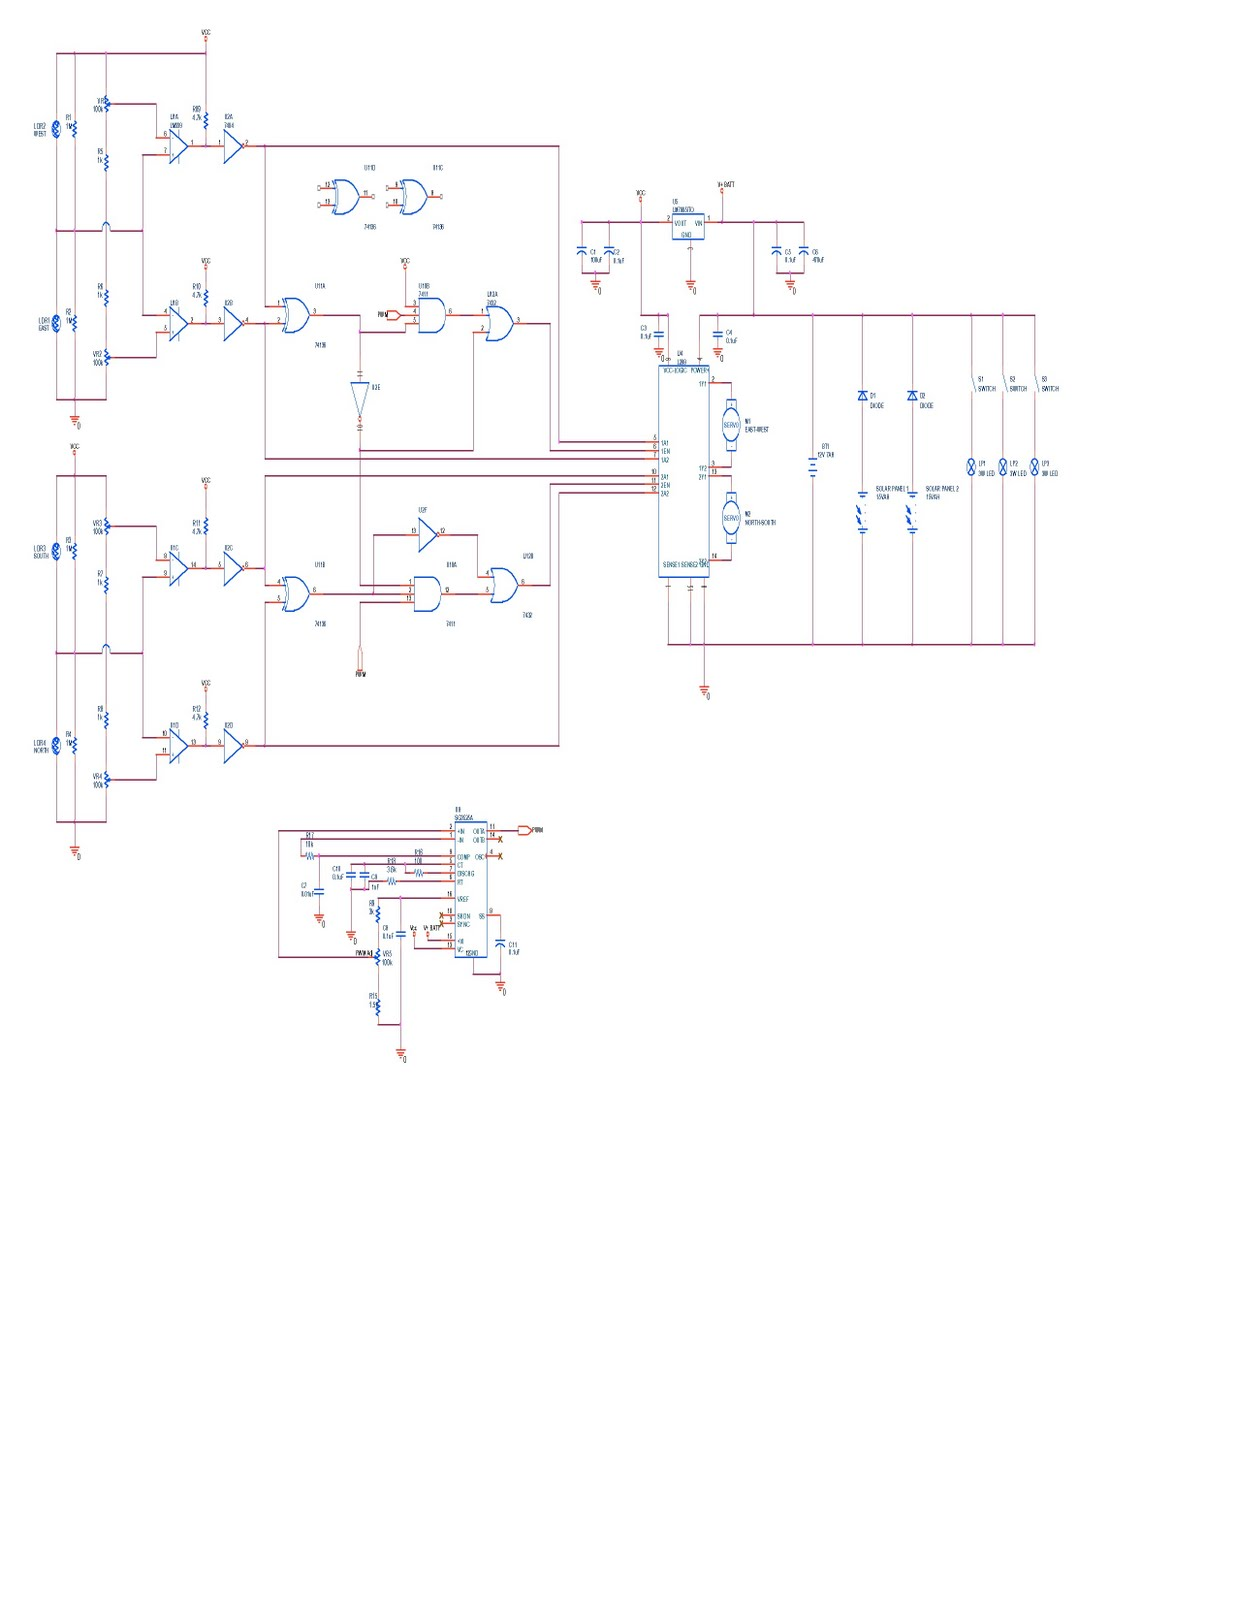 small resolution of gainamplifier1 amplifiercircuit circuit diagram seekiccom data coaxial cable driver circuit diagram tradeoficcom